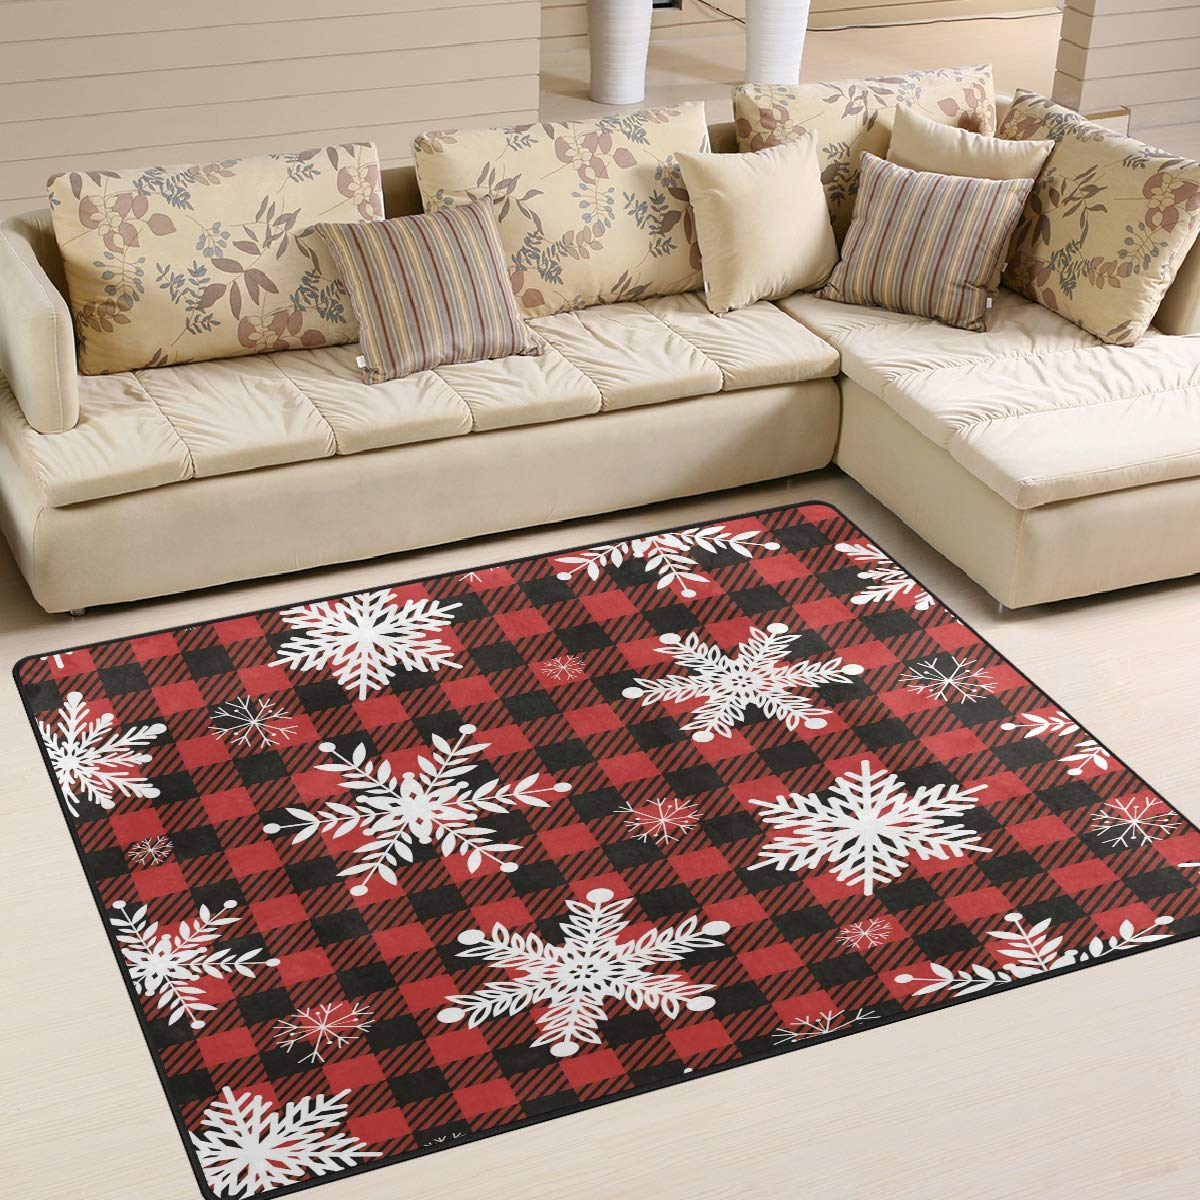 ALAZA Home Decoration Snowflakes Red Black Buffalo Plaid Large Rug Floor Carpet Yoga Mat, Modern Area Rug for Children Kid Playroom Bedroom, 5' x 7'